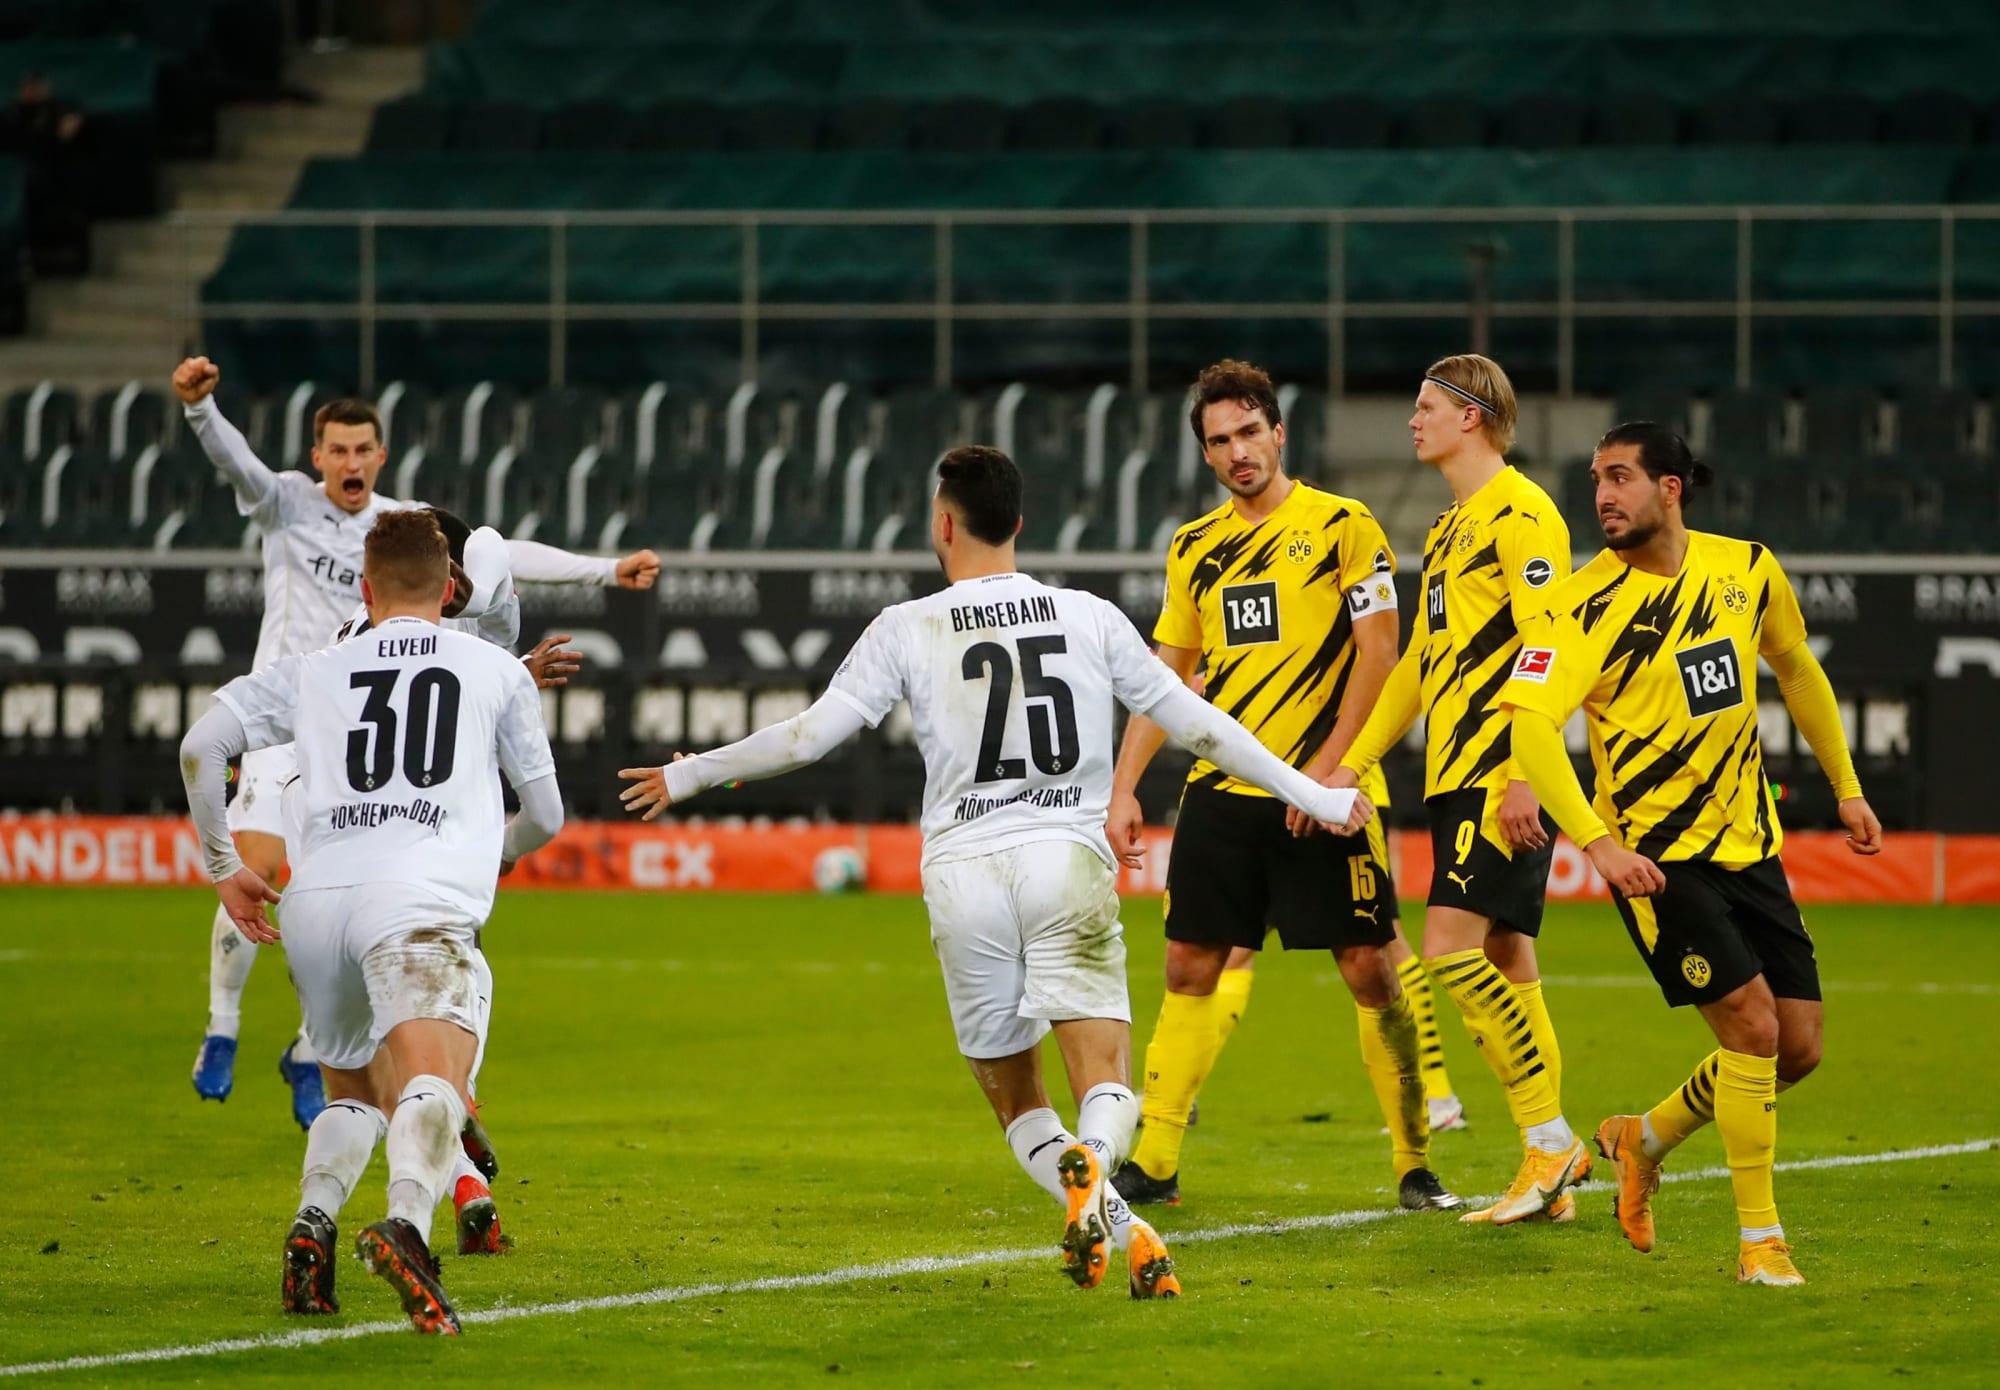 Borussia Dortmund player ratings from 4-2 defeat to Mönchengladbach: Haaland brace in vain